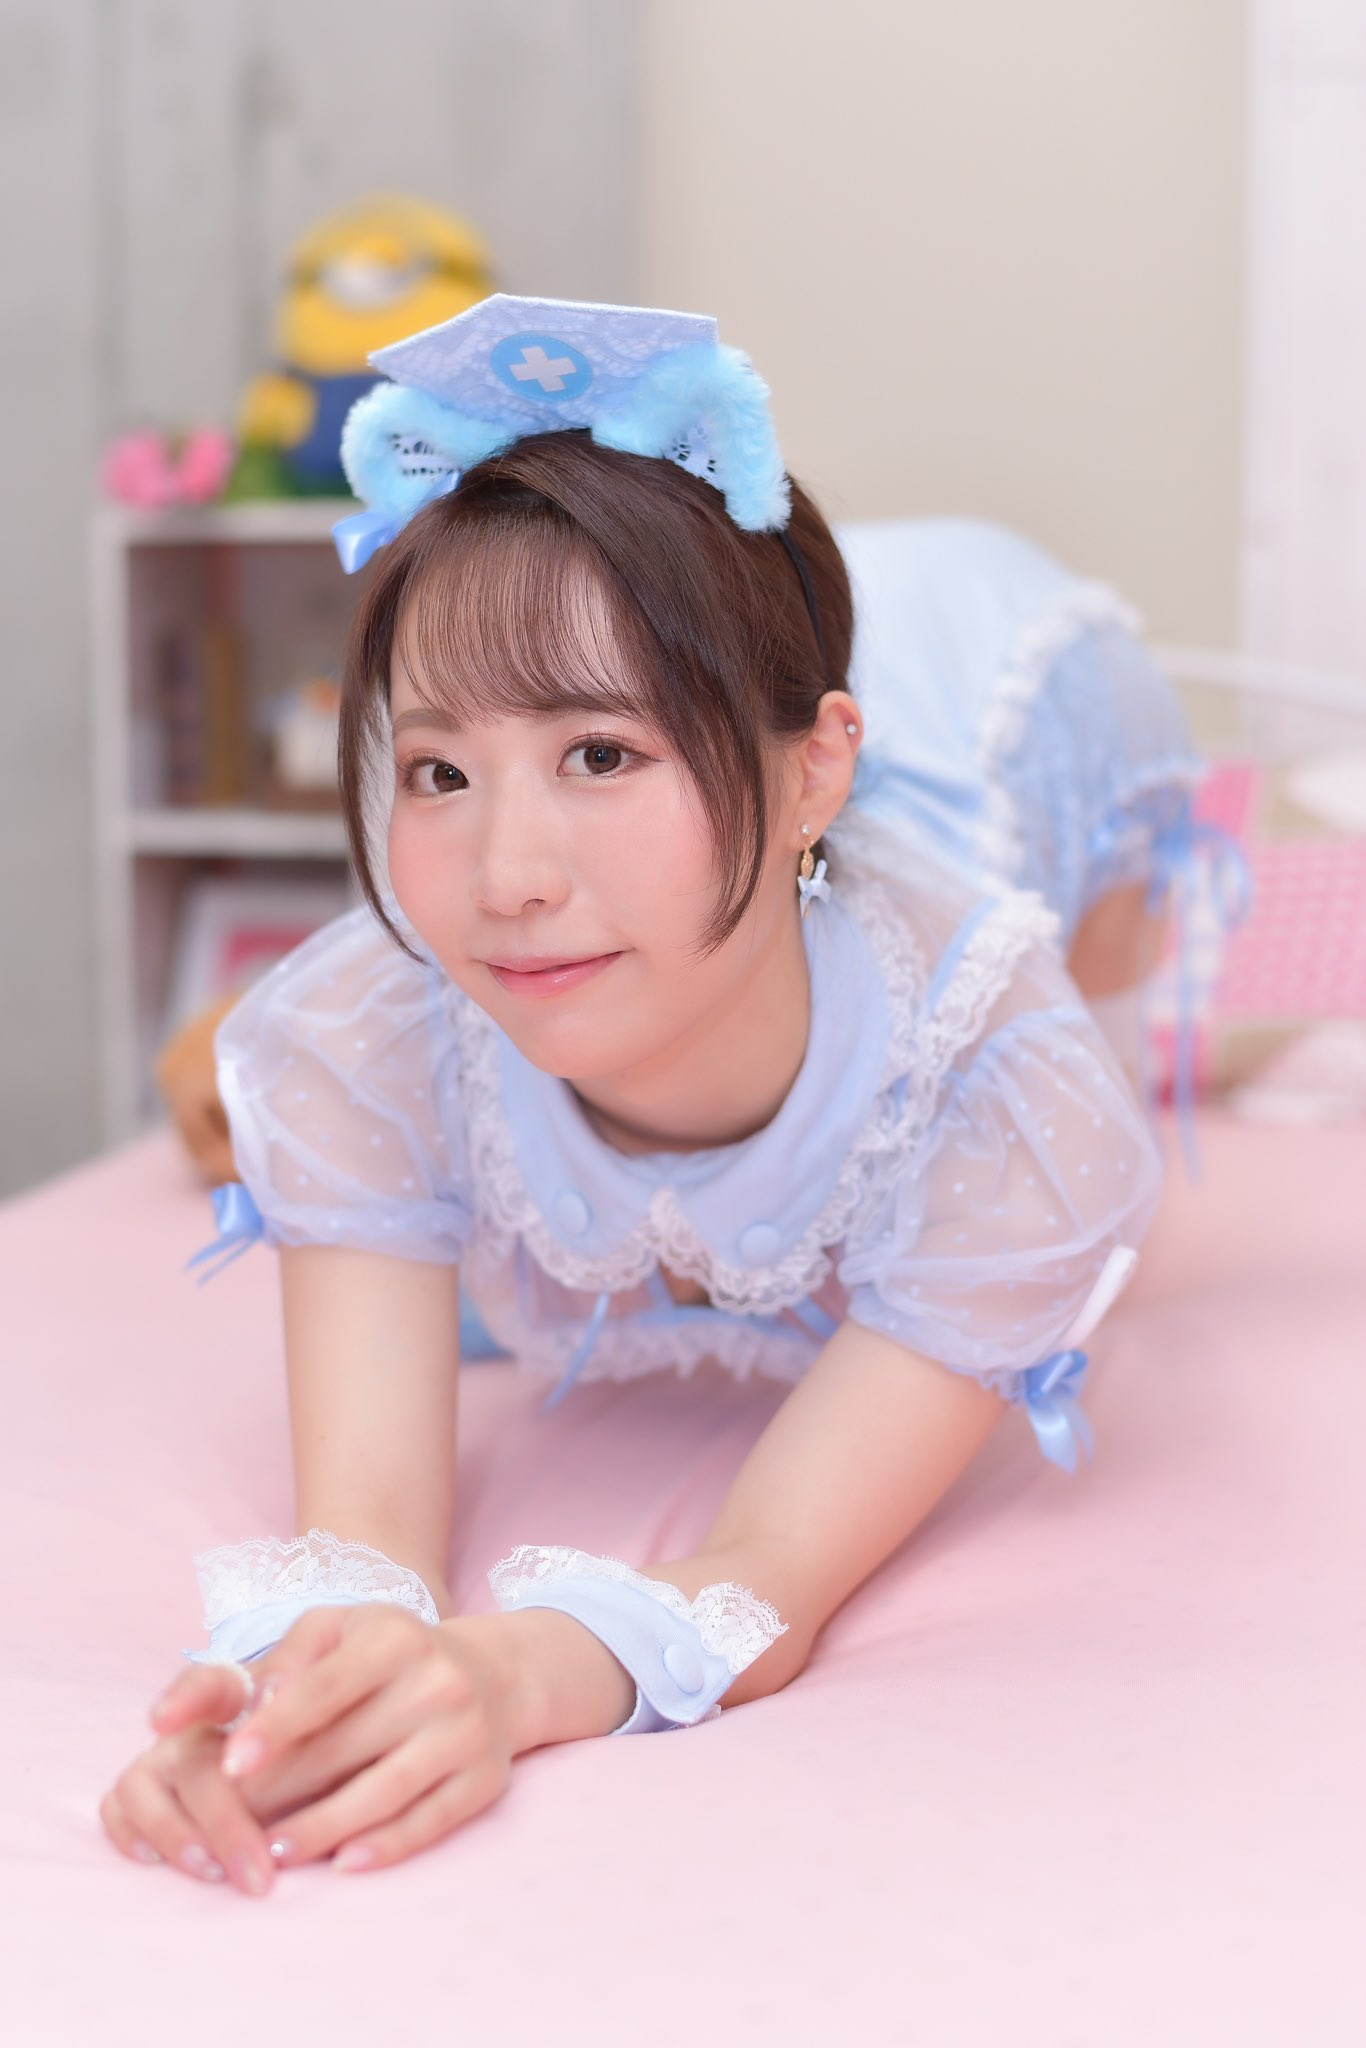 rogufuku-1429777752647823365-20210823_200914-img2.jpg